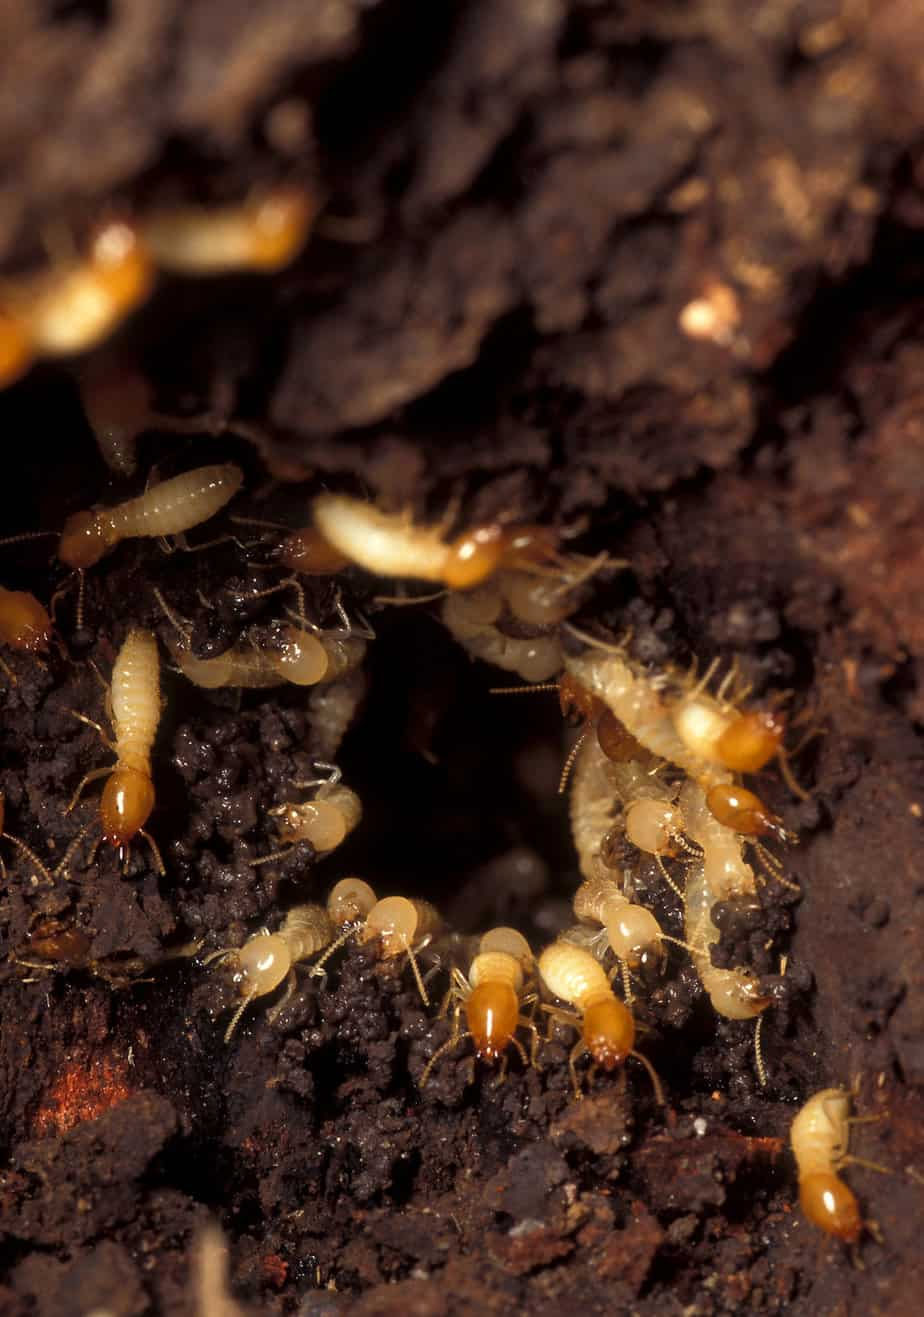 Pest Control Dr Termites Safe Pest Removal Termite Experts